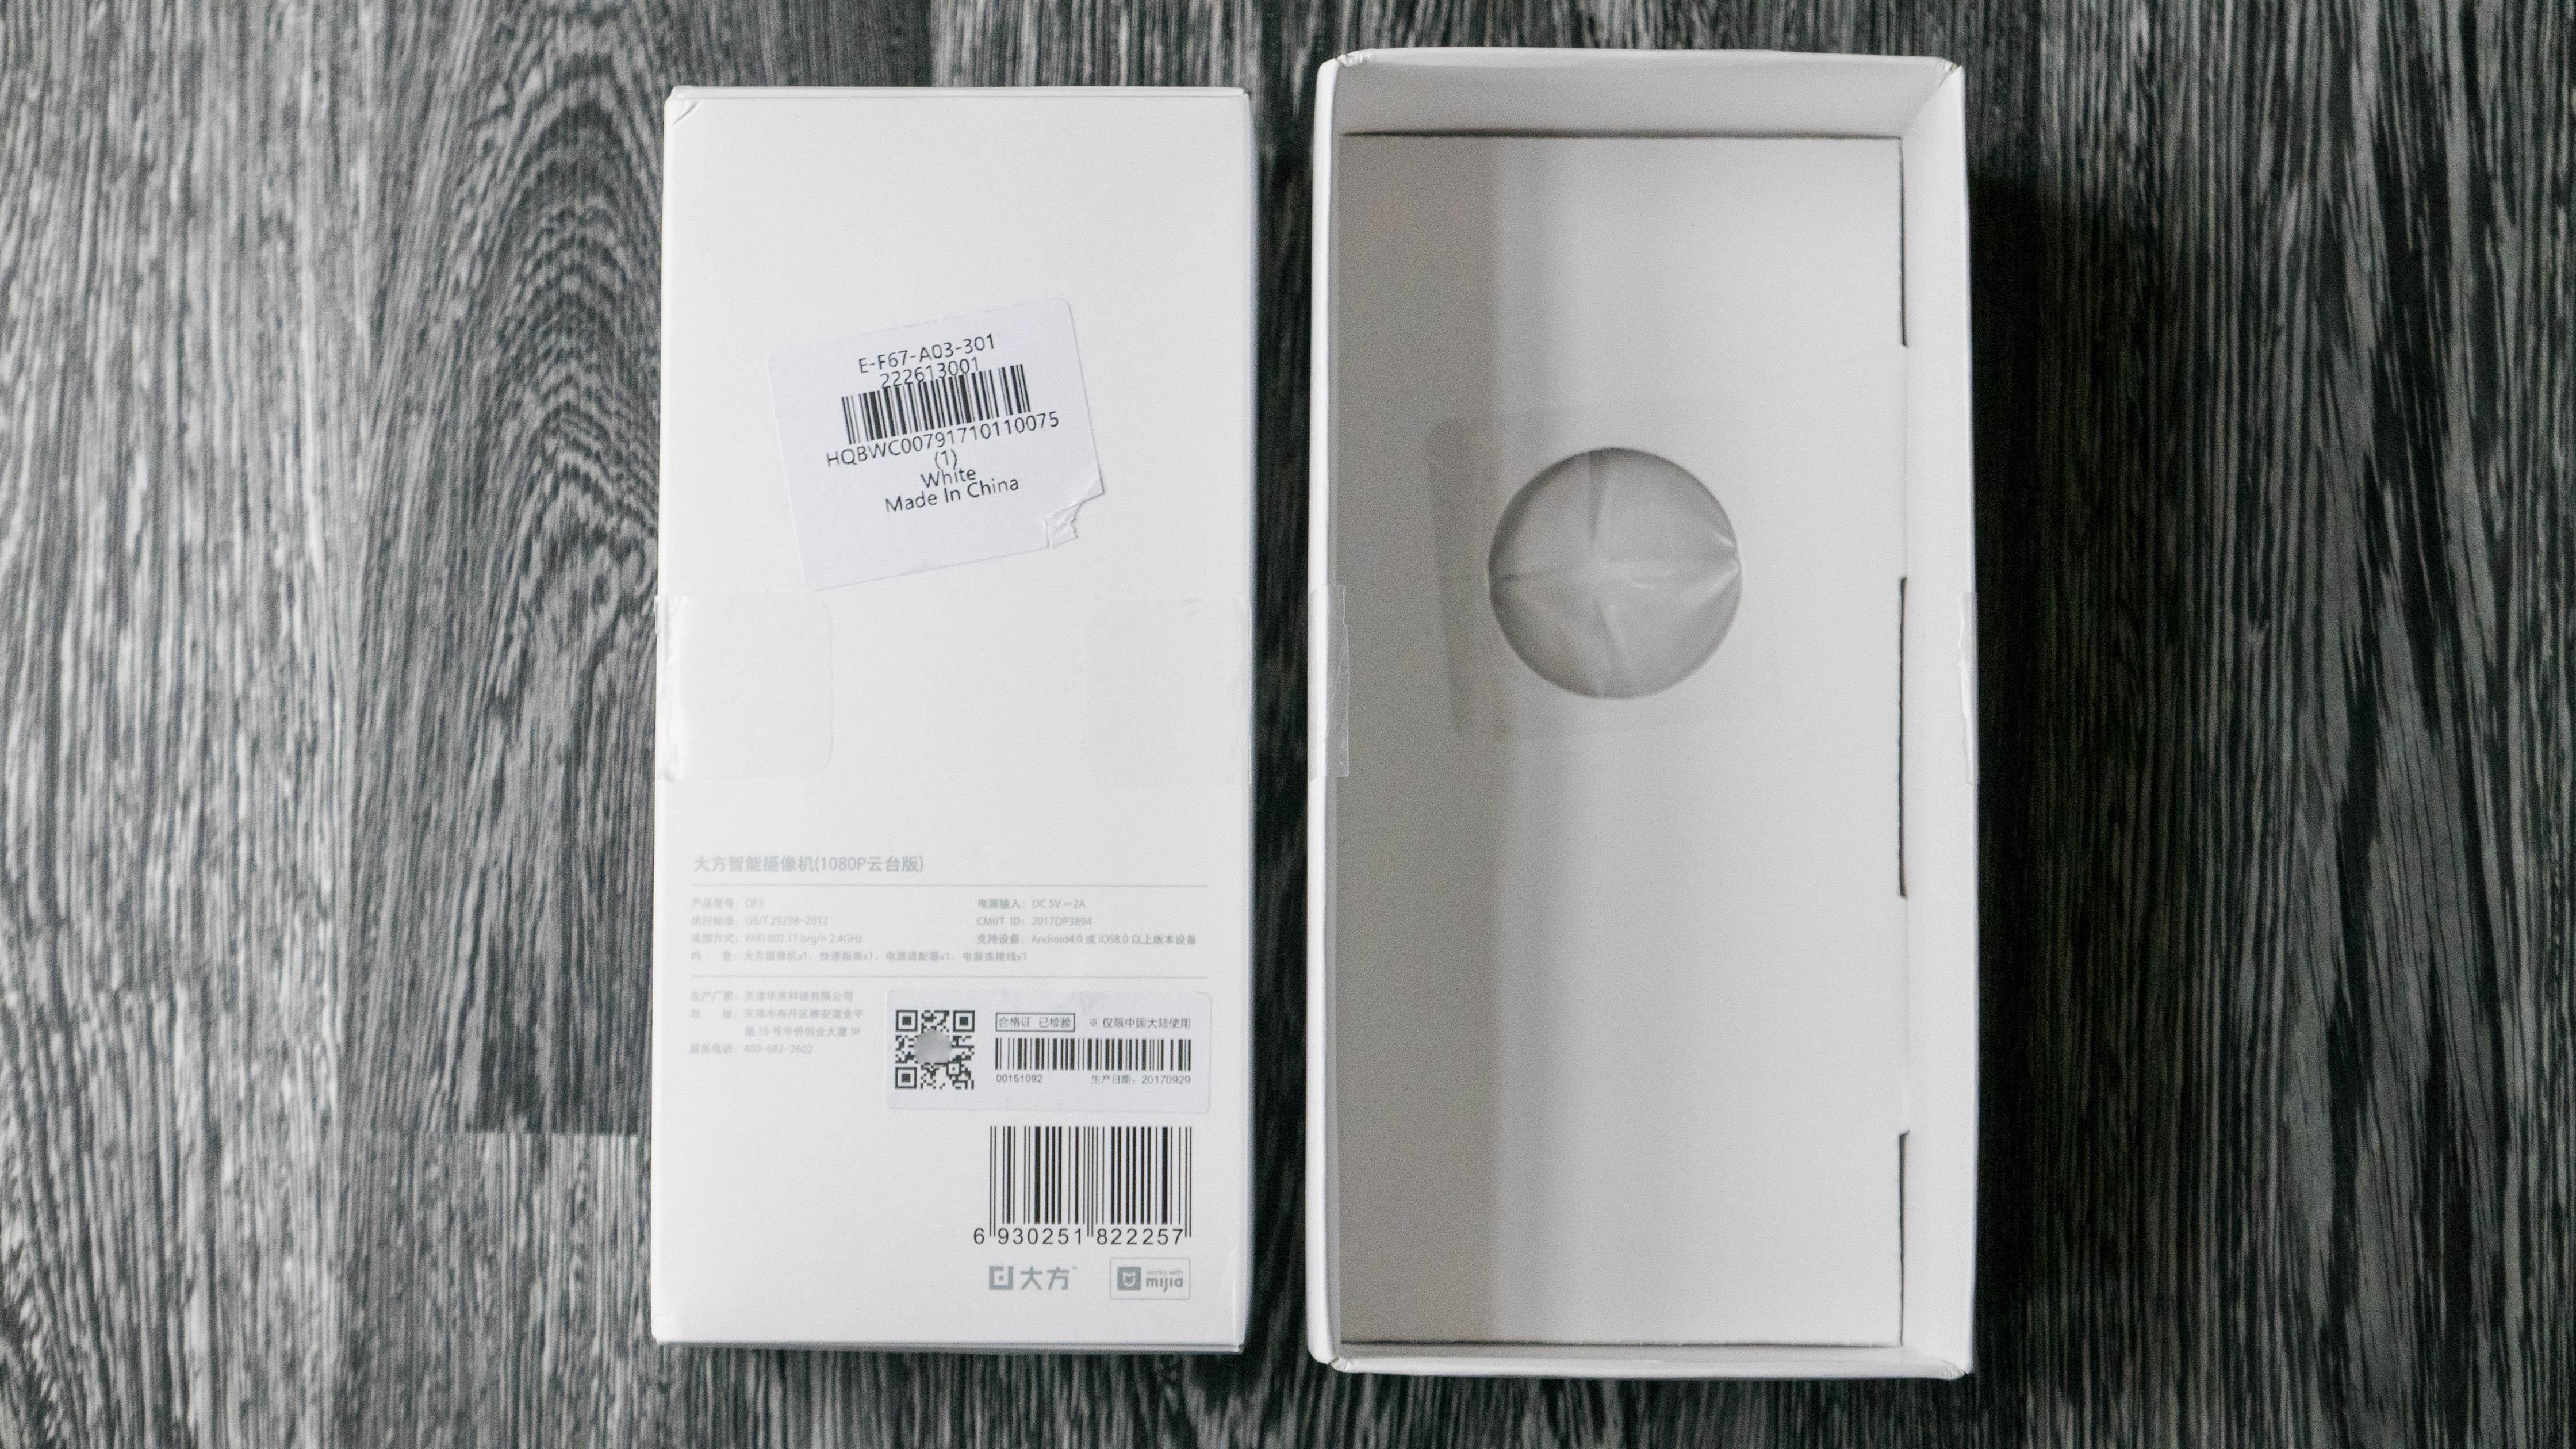 Xiaomi Dafang 1080p Camera 4